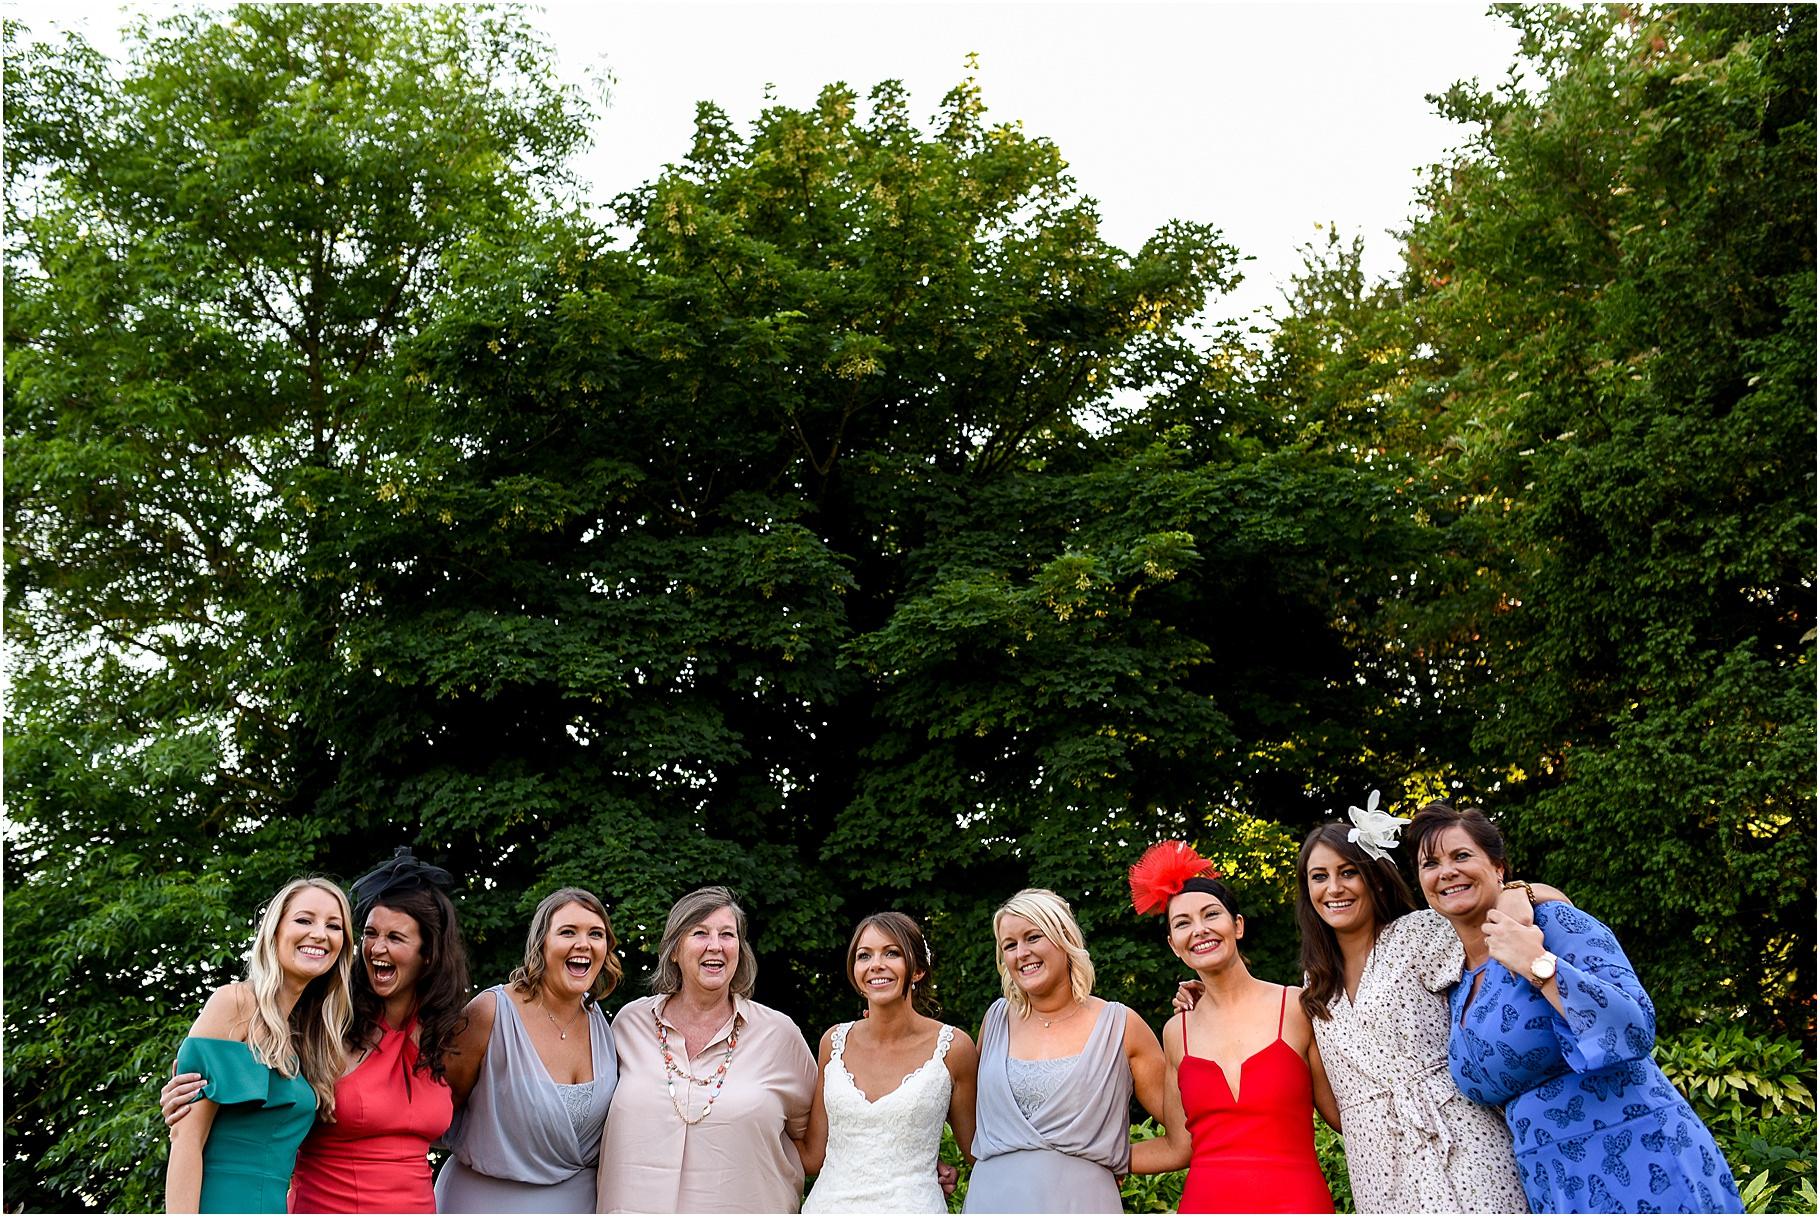 the-villa-wrea-green-wedding-photographer-62.jpg